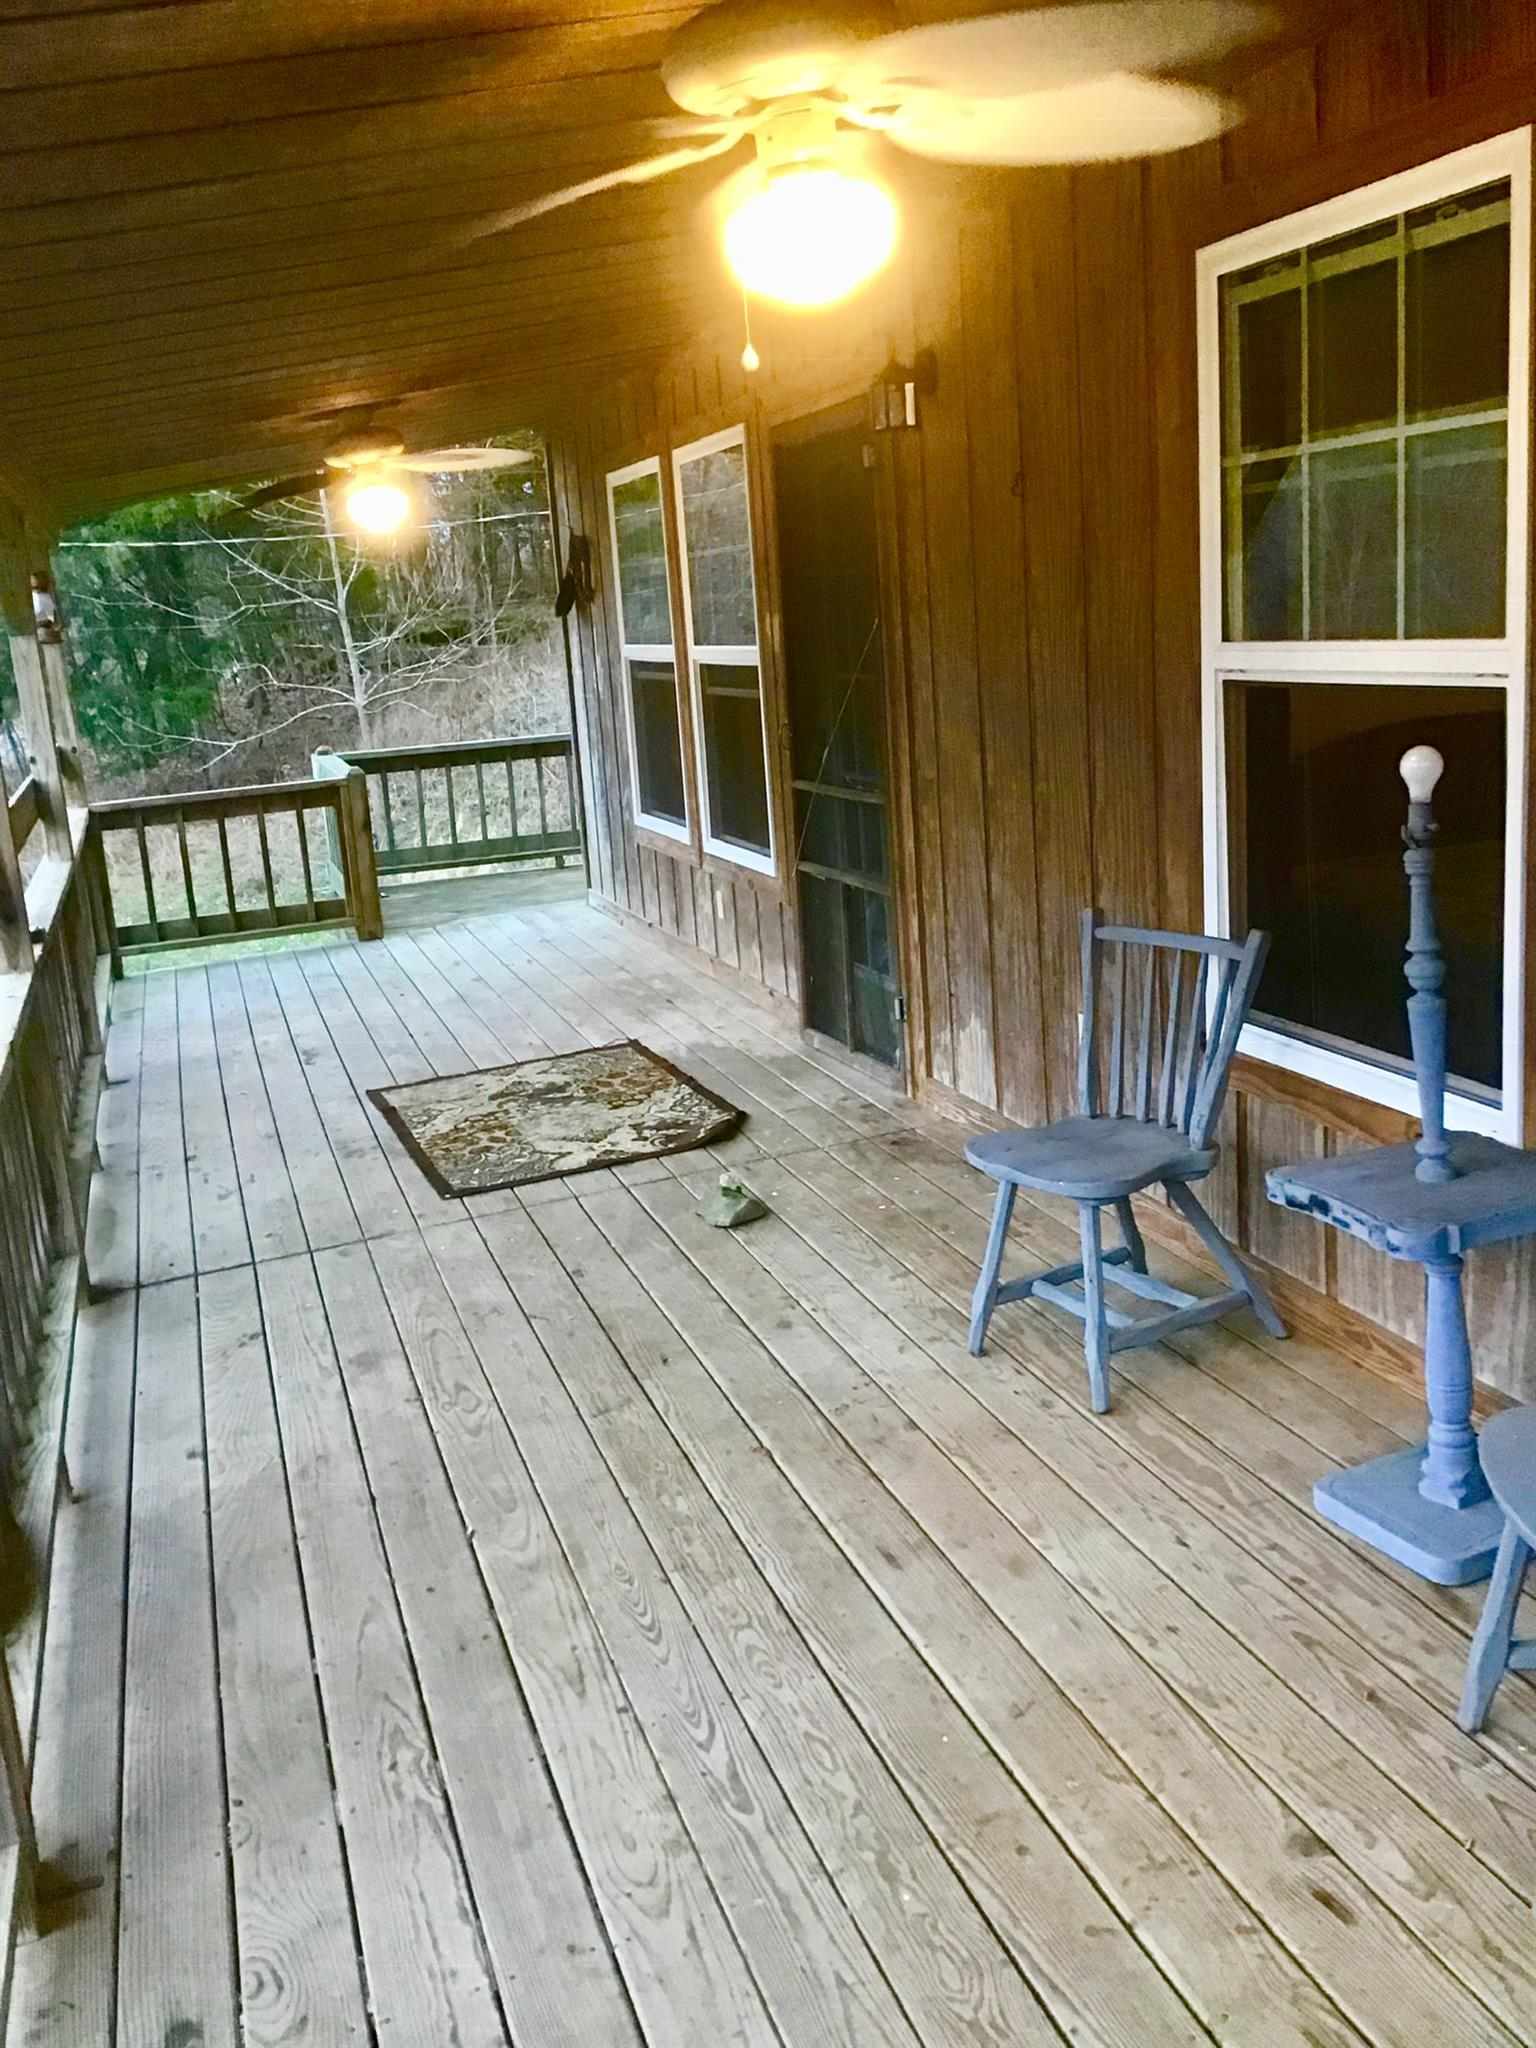 272 Forrester Hollow Ln, Granville, TN 38564 - Granville, TN real estate listing